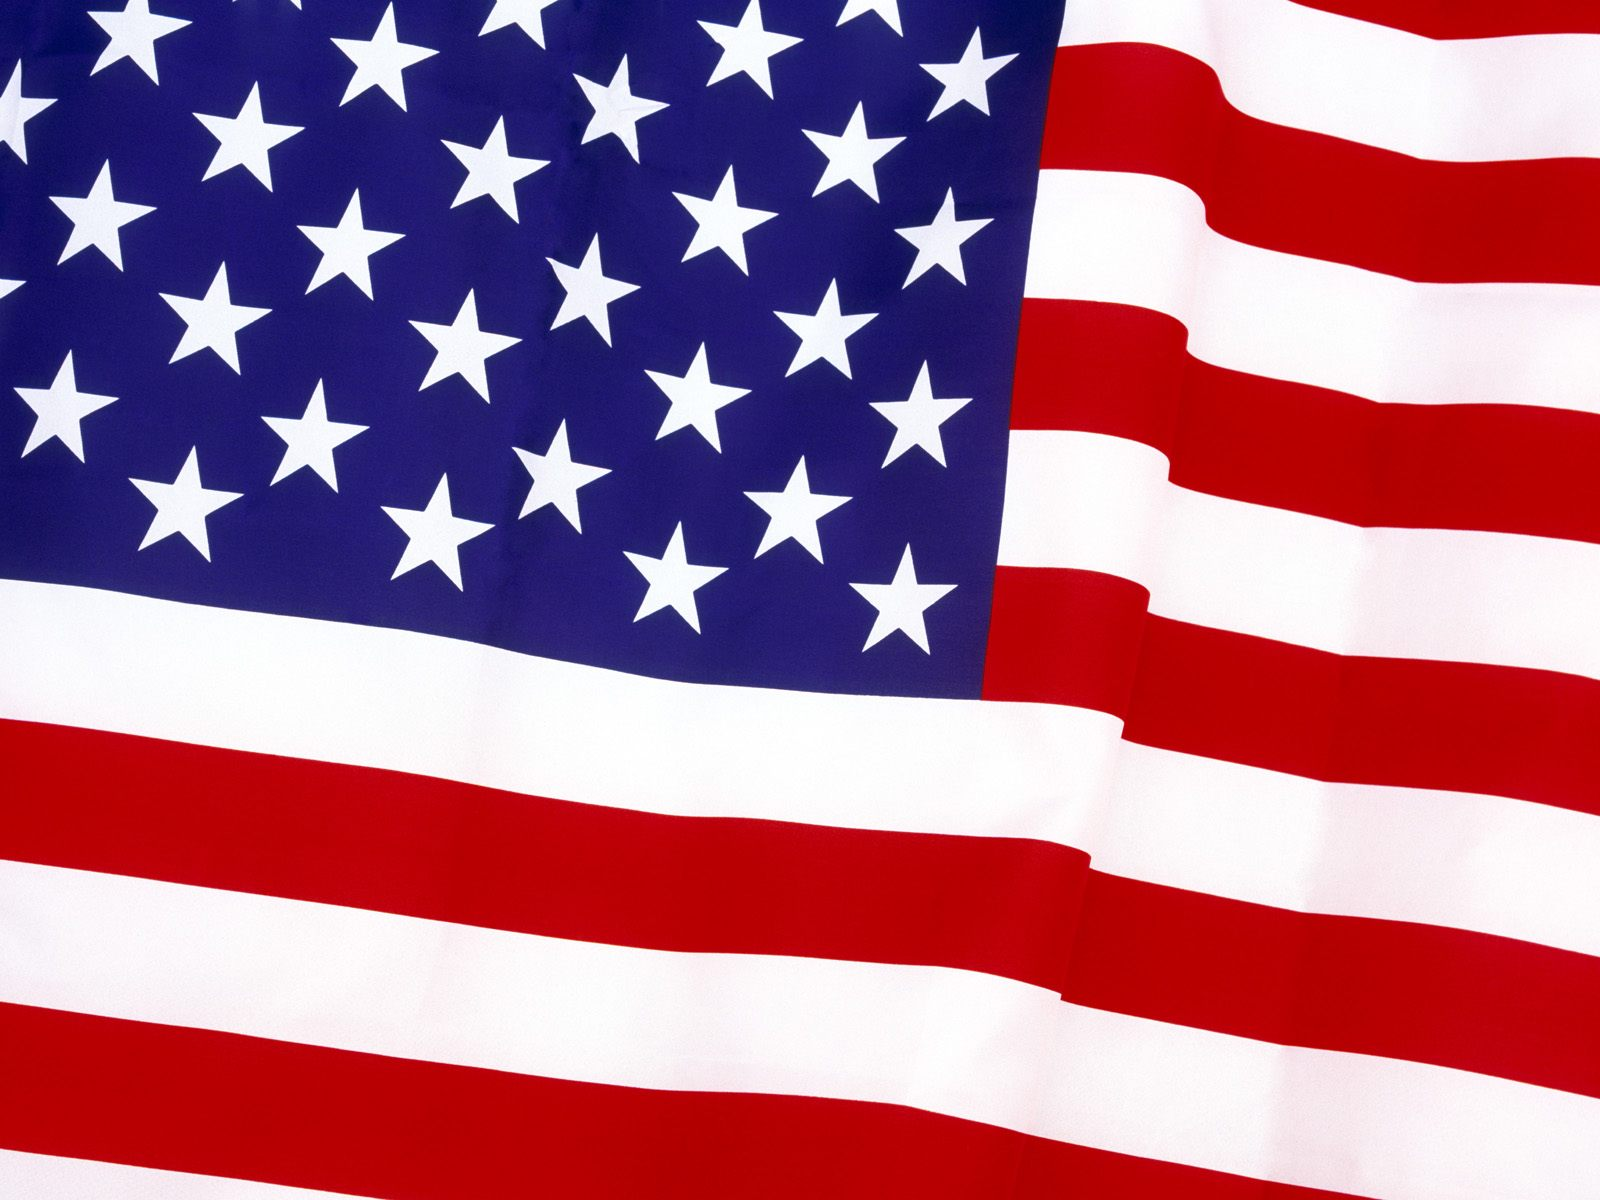 Hd wallpepars american flag hd wallpapers - American flag hd ...